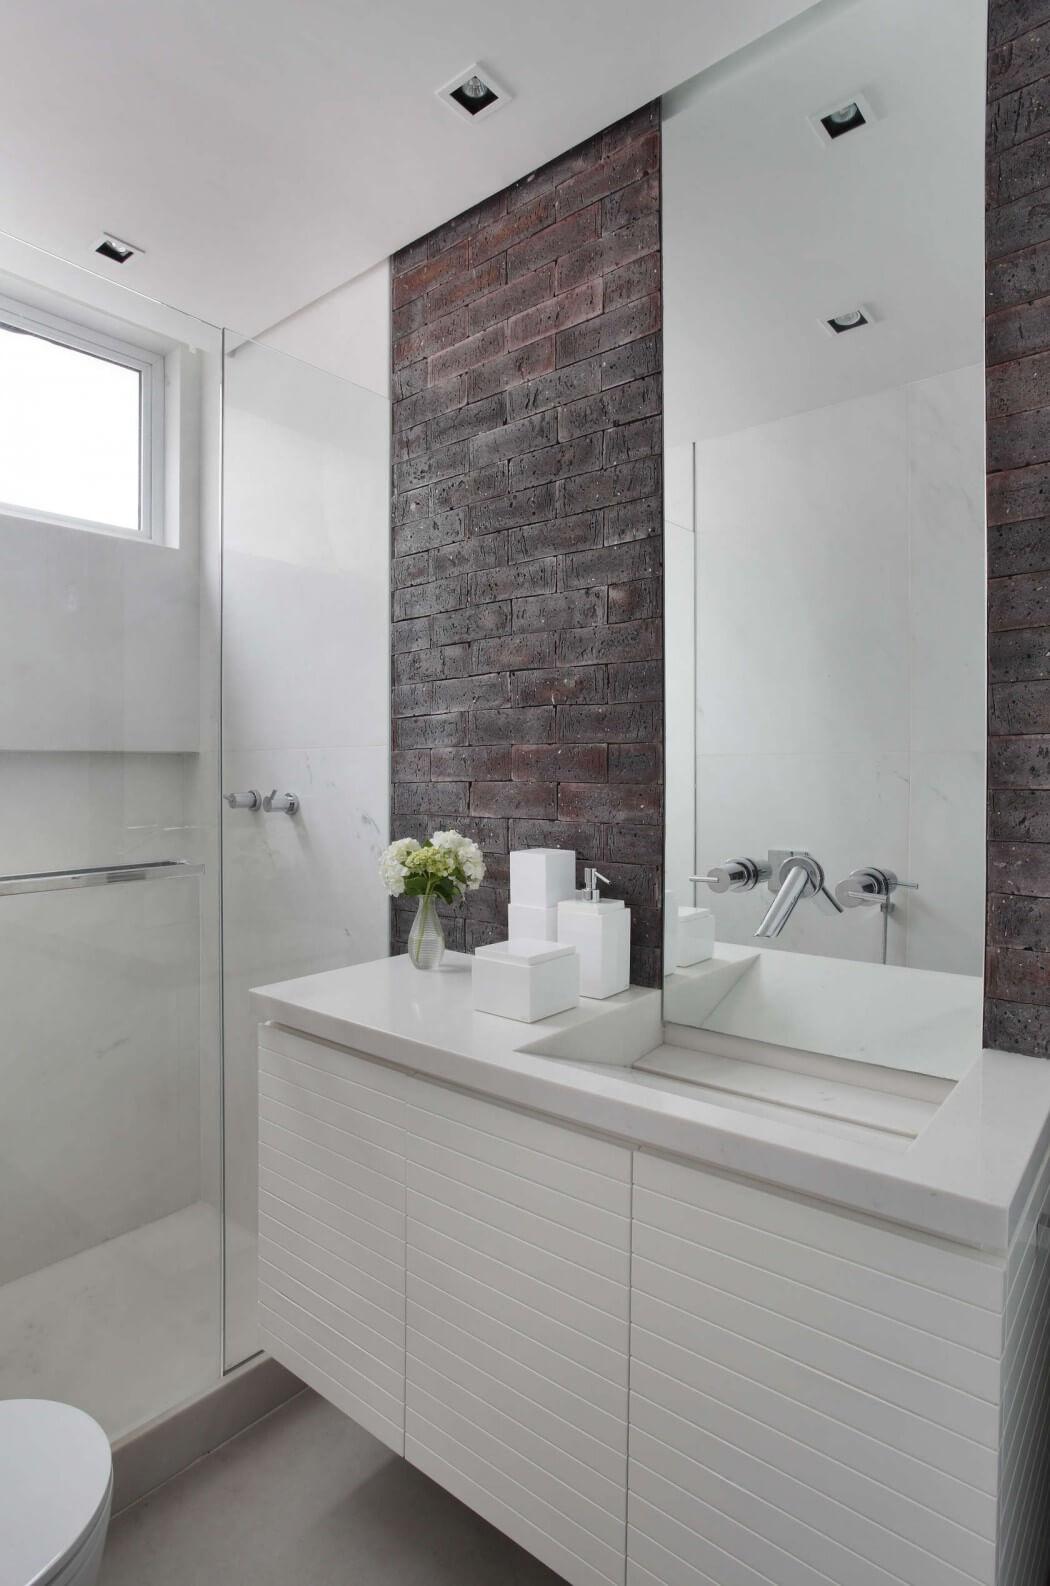 011-vf-apartment-studio-roca-1050x1586